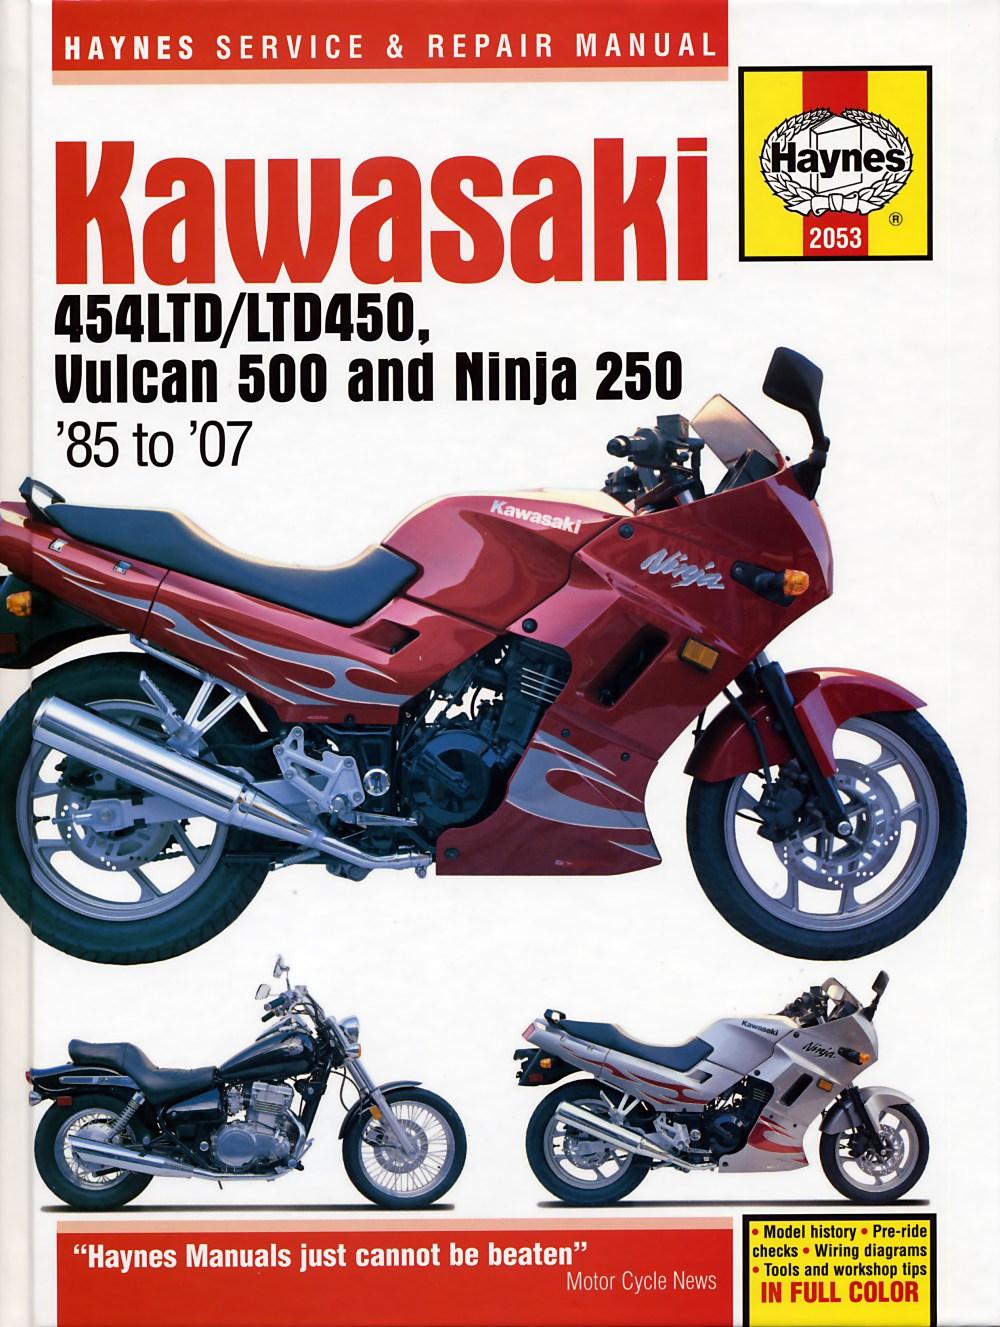 medium resolution of kawasaki 454ltd ltd450 vulcan 500 ninja 250 85 07 haynes repair manual haynes verkstadhanbokhaynes verkstadhanbok wiring diagram